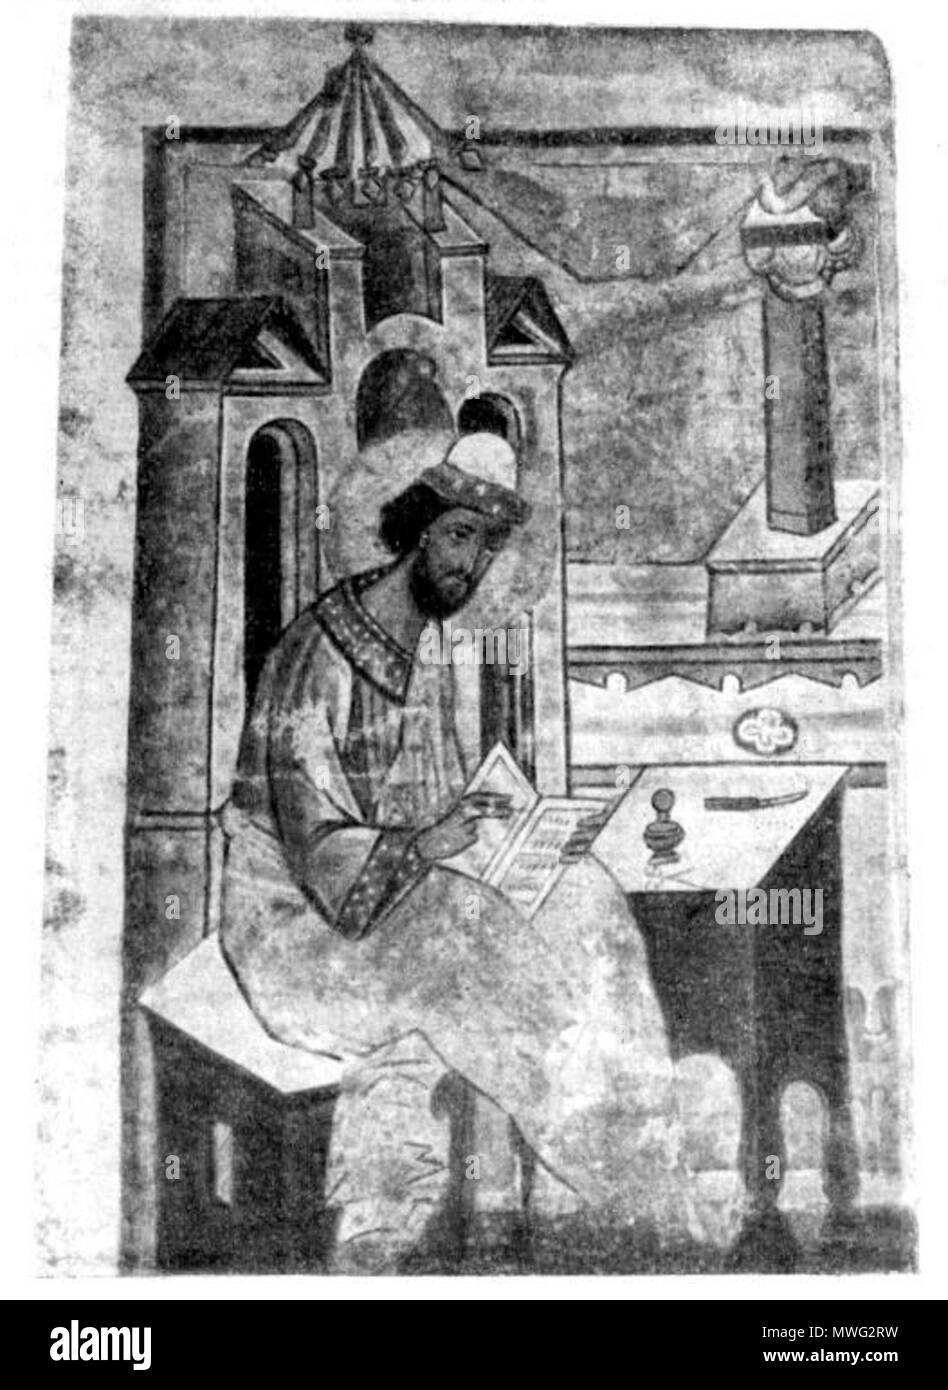 . English: Portrait of Cosmas Indicopleustes, from Russian manuscript of XV c., owned by count A. S. Uvarov. Reproduced from Vizantiiskiy Vremennik, 1905 . 31 March 2013, 14:29:21. Unknown 347 Kosma-Uvarov - Stock Image